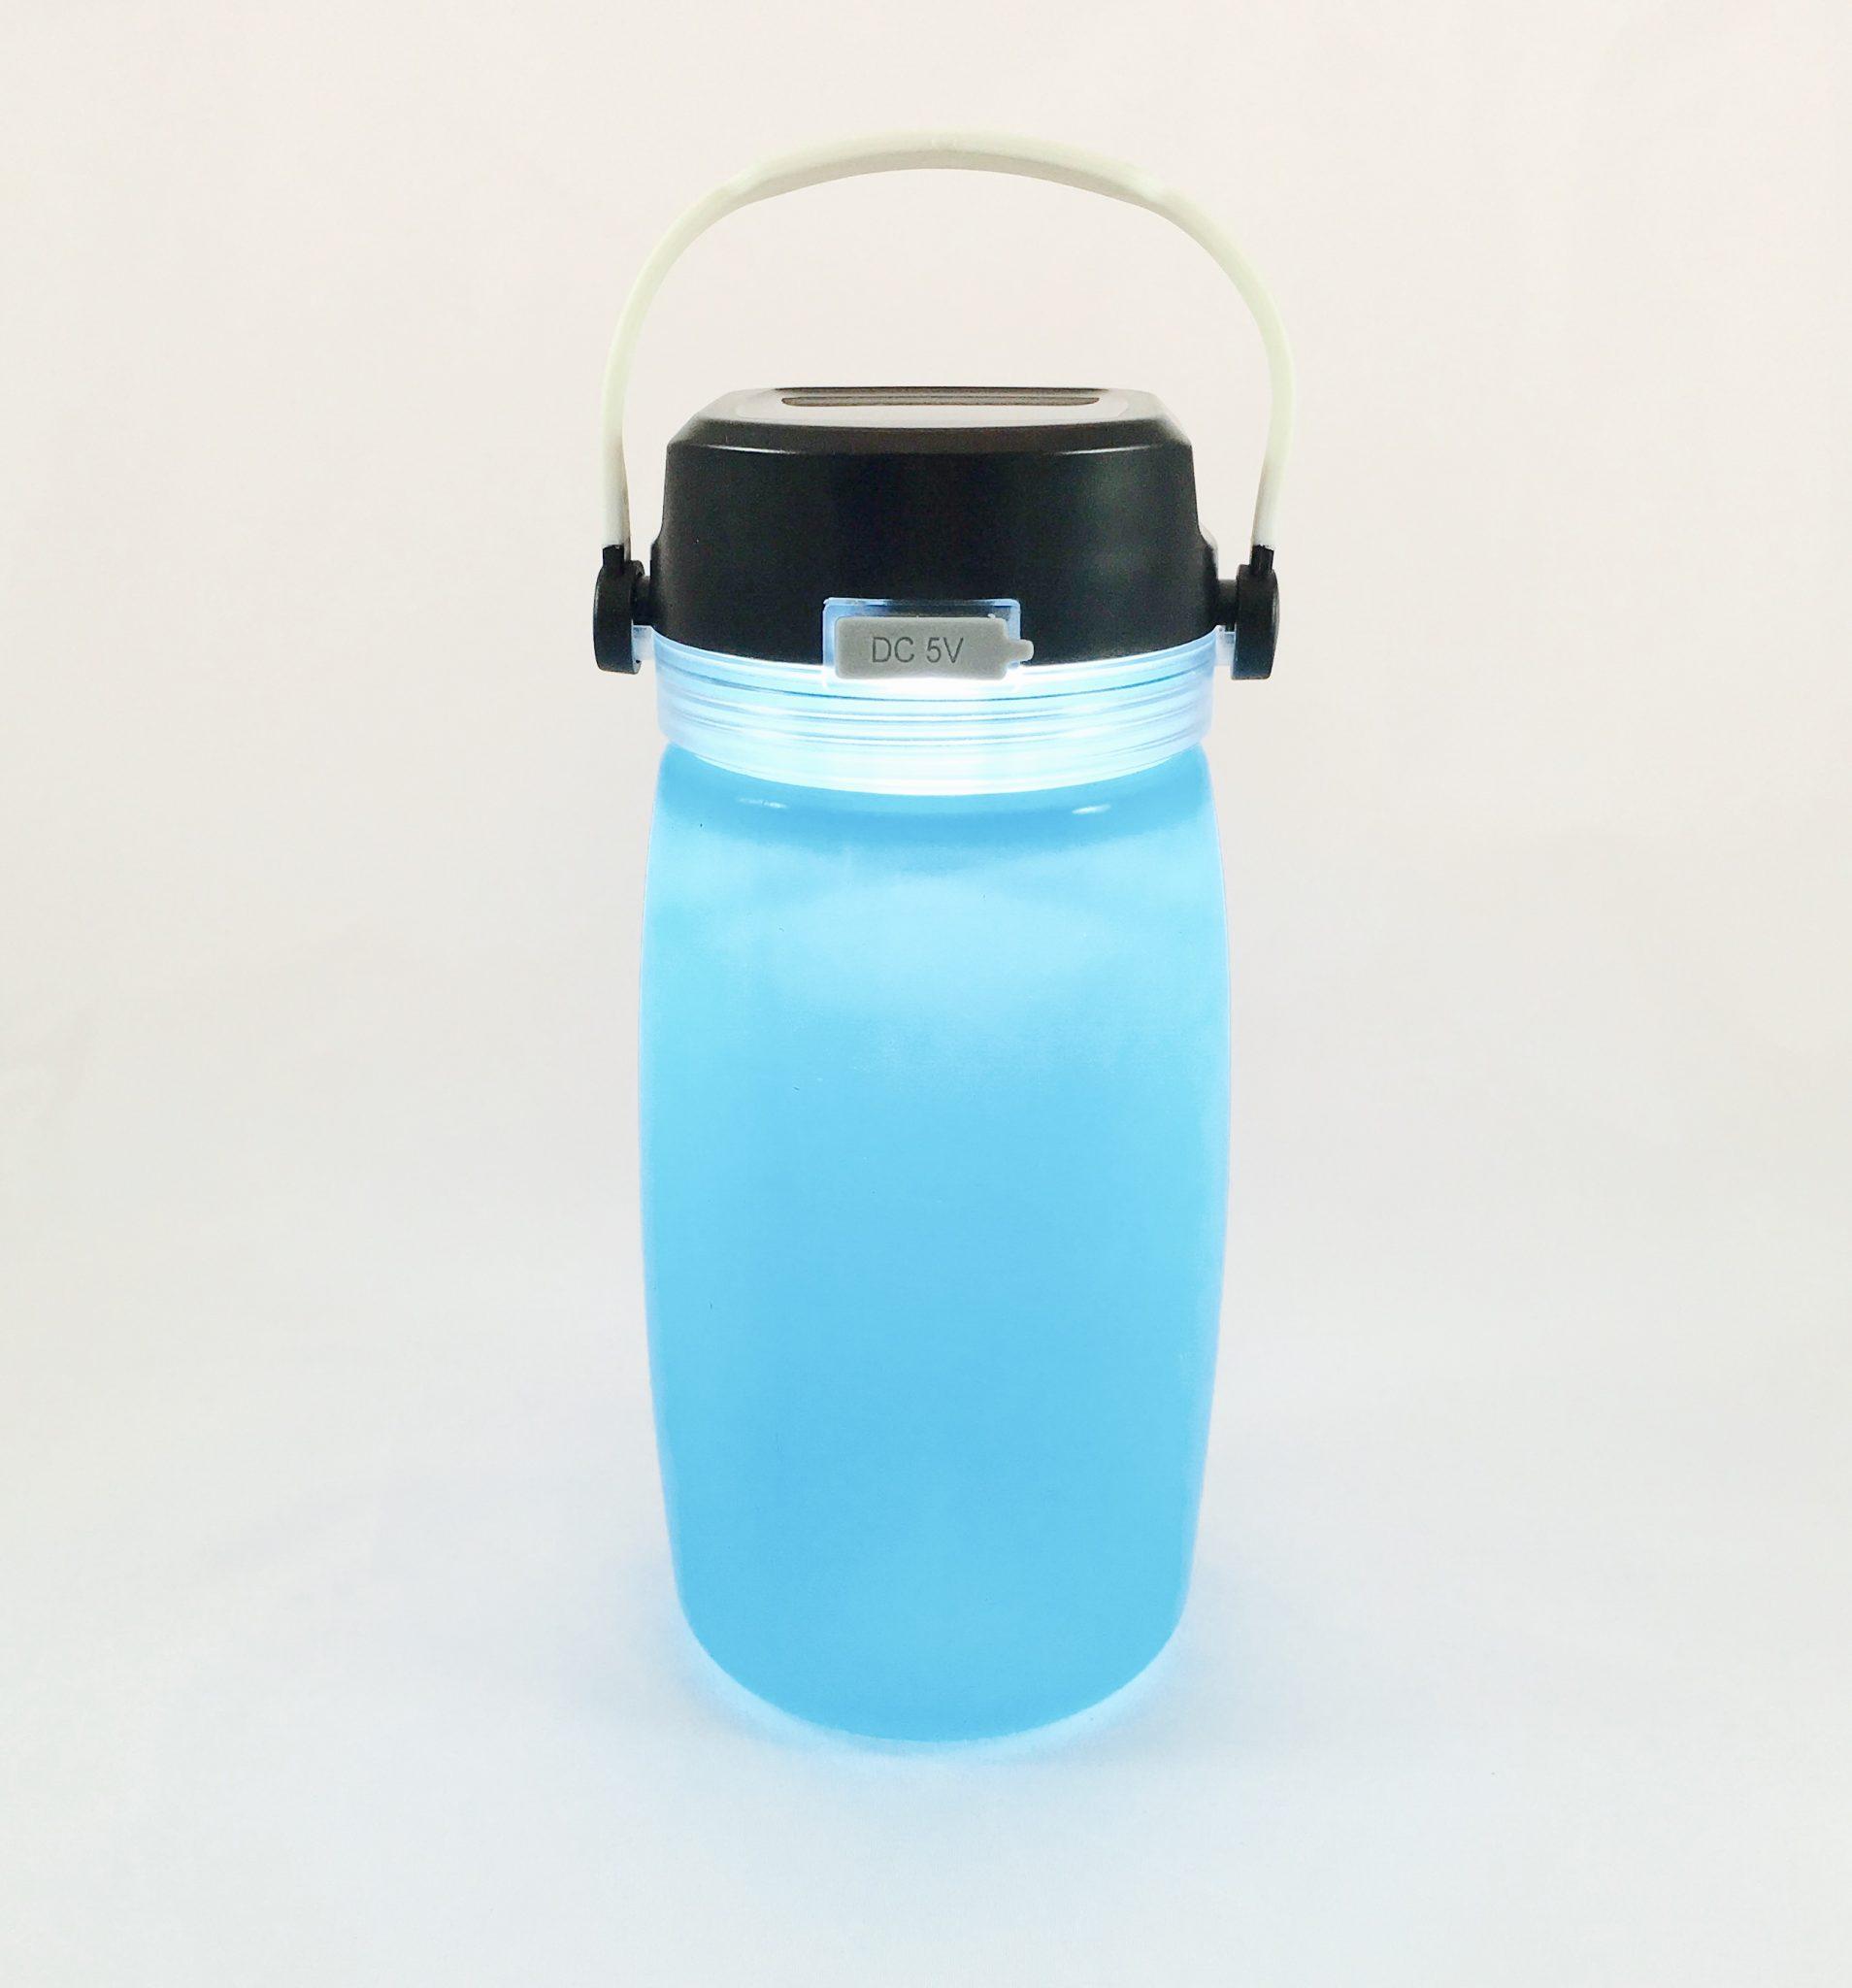 Gizadget™ Solar Lantern Humidor